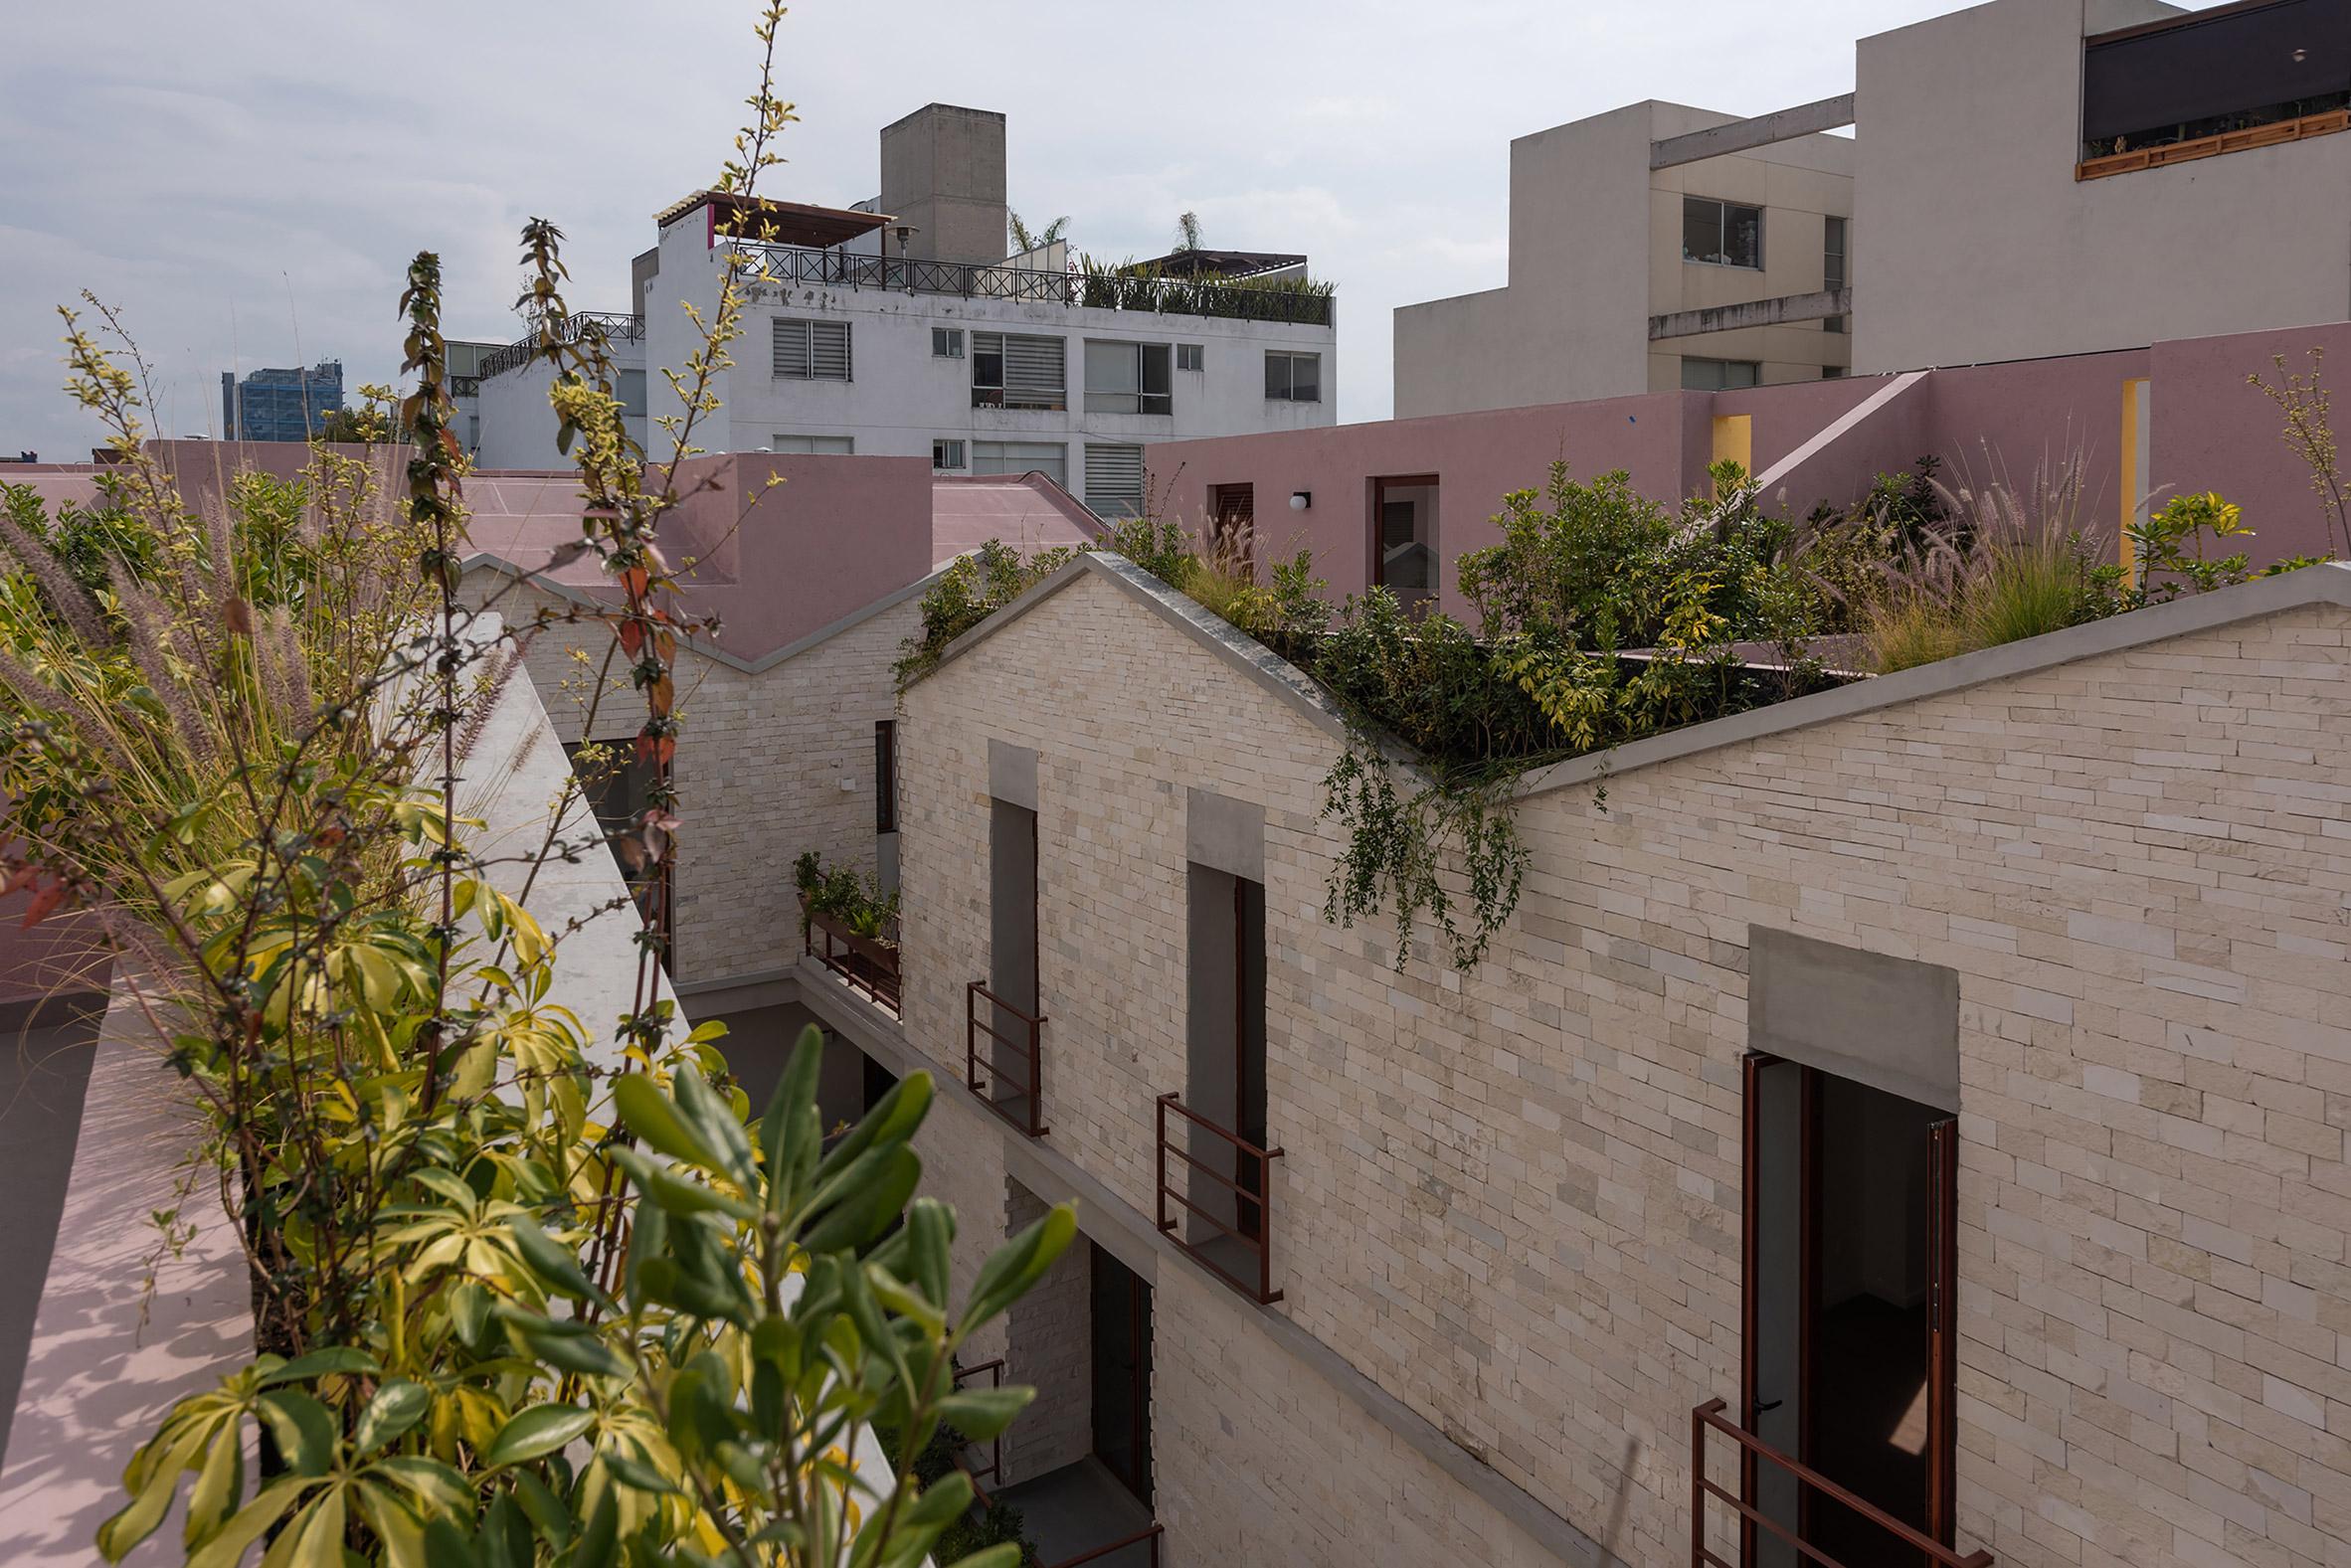 The team created triangular balconies that jut over a sidewalk